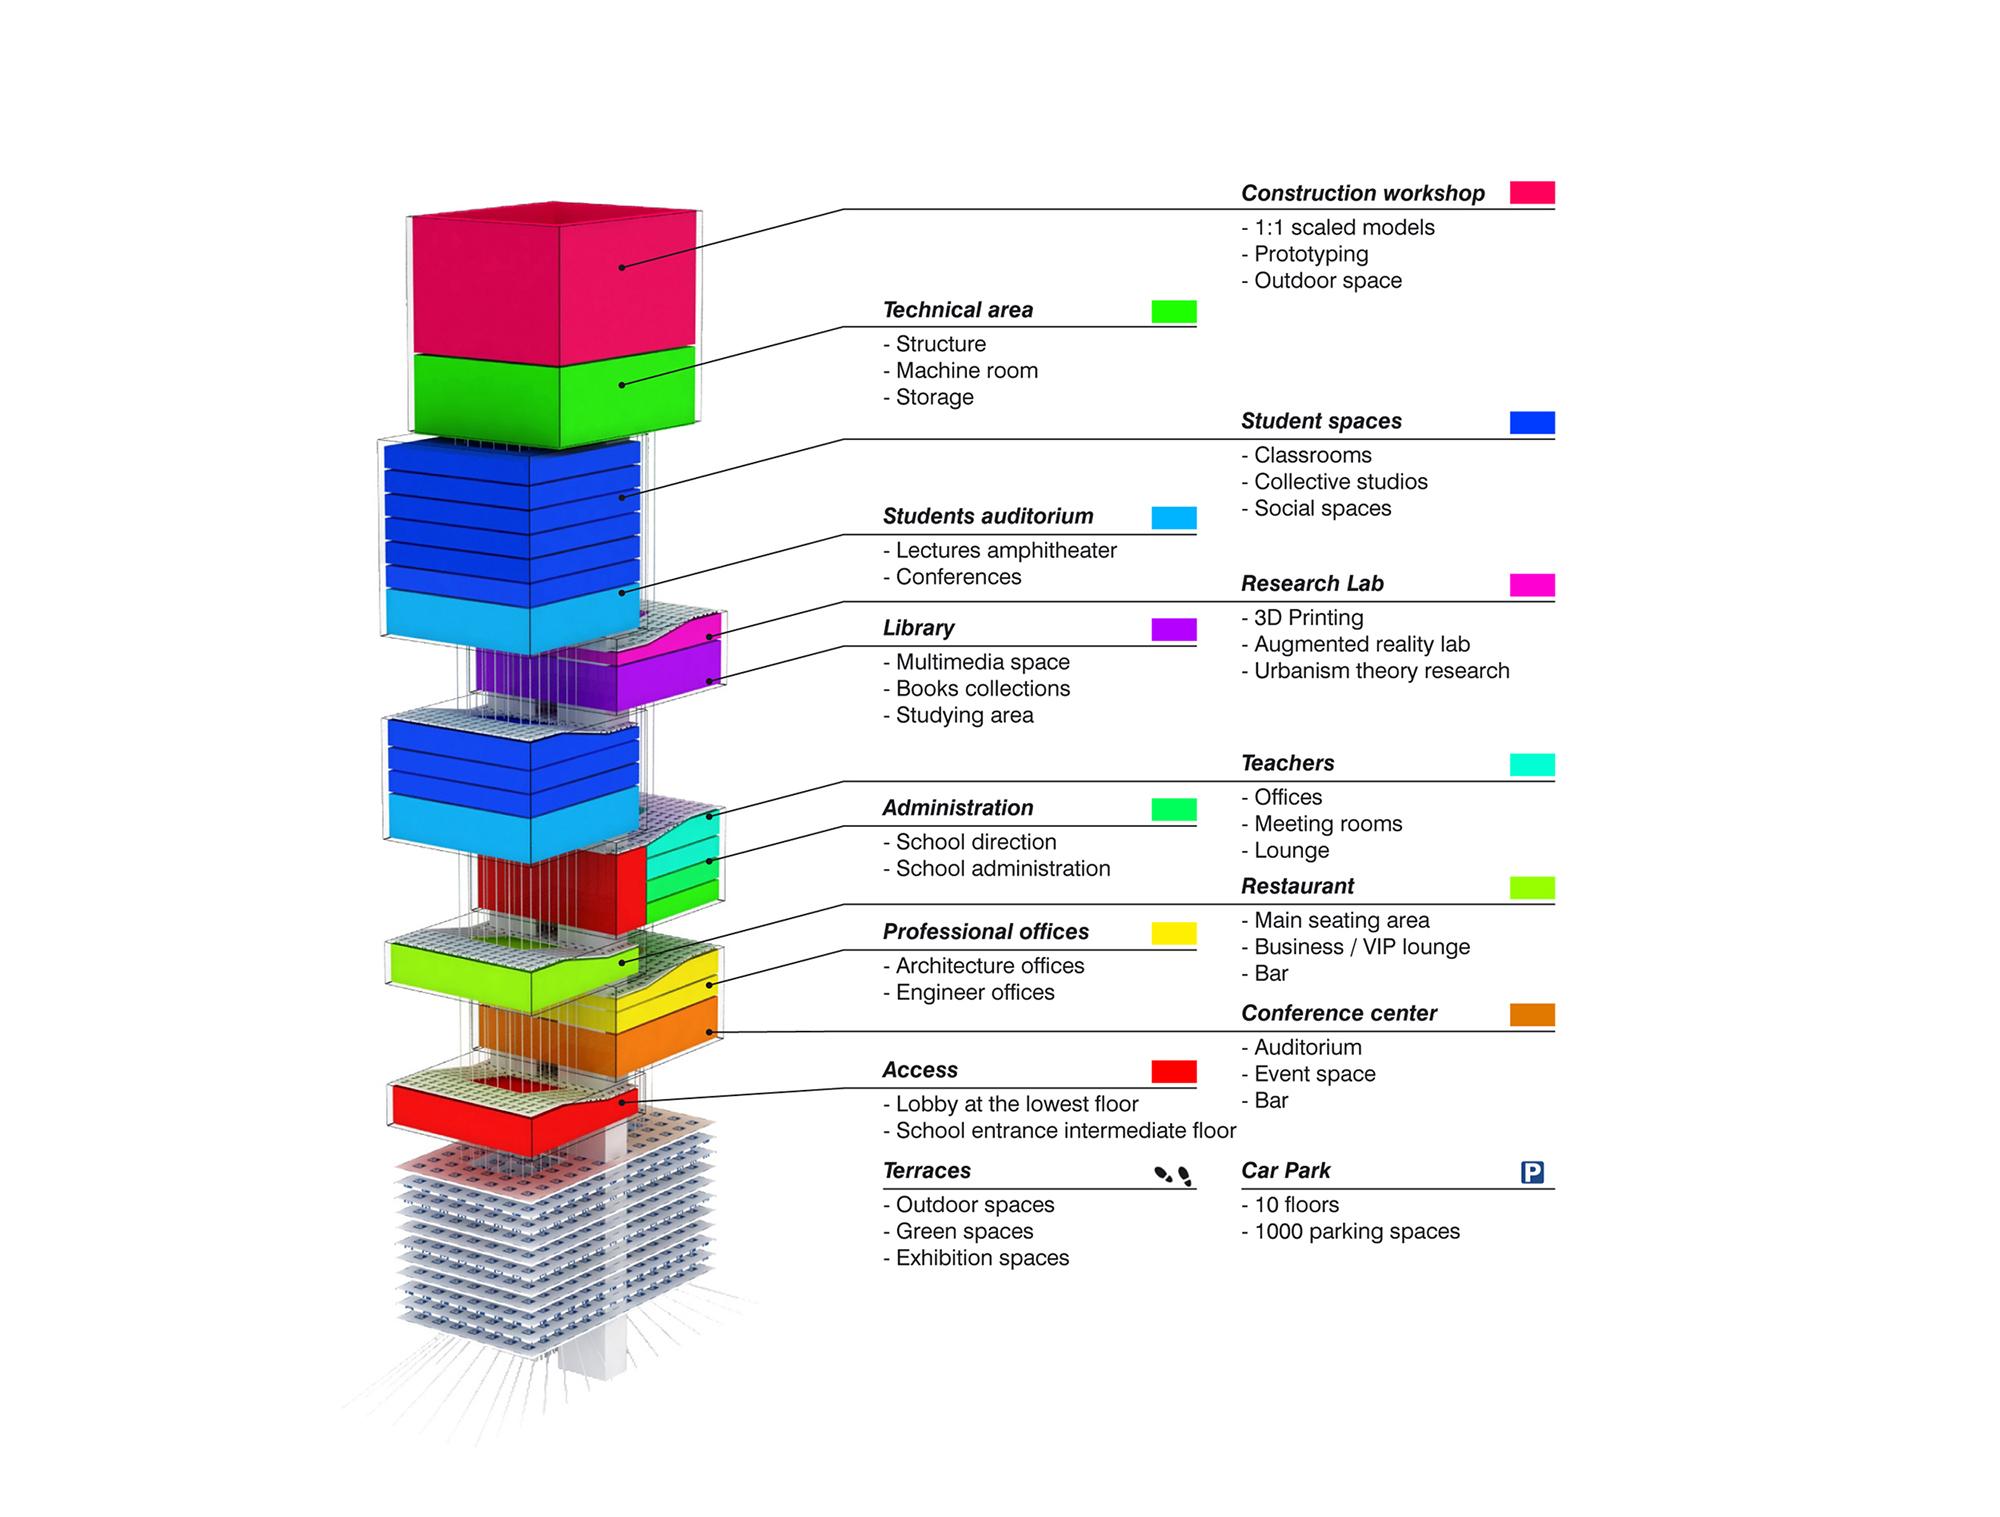 architectural program diagram and 2 spinal cord nerves the shift architecture school tower hkz mena design